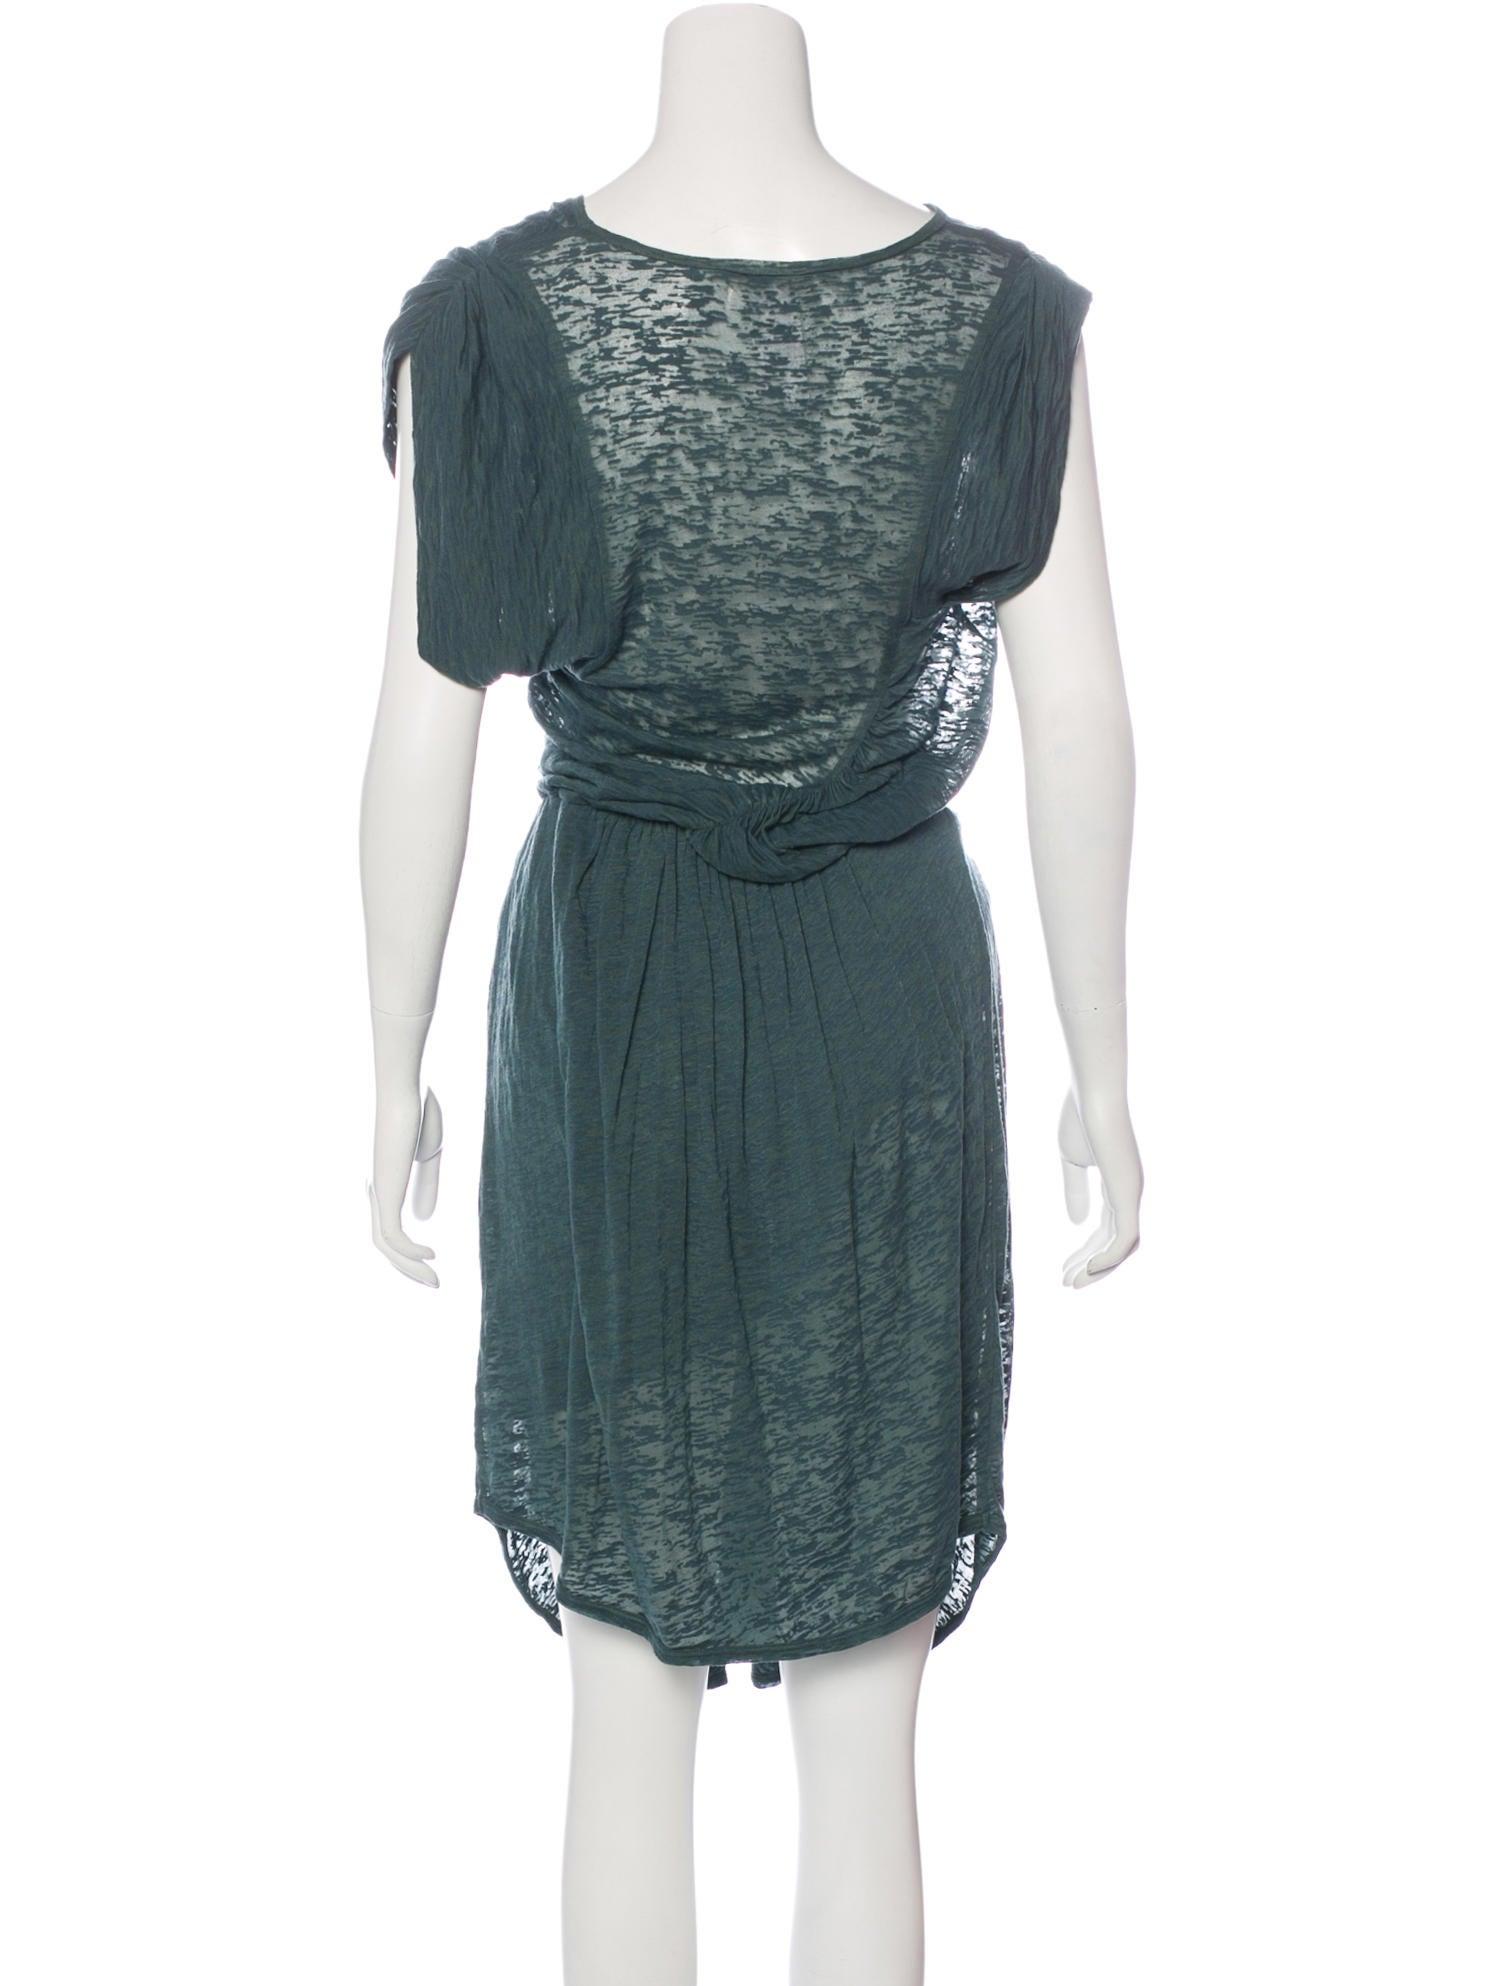 Toile isabel marant ruched midi dress clothing for Isabel marant shirt dress